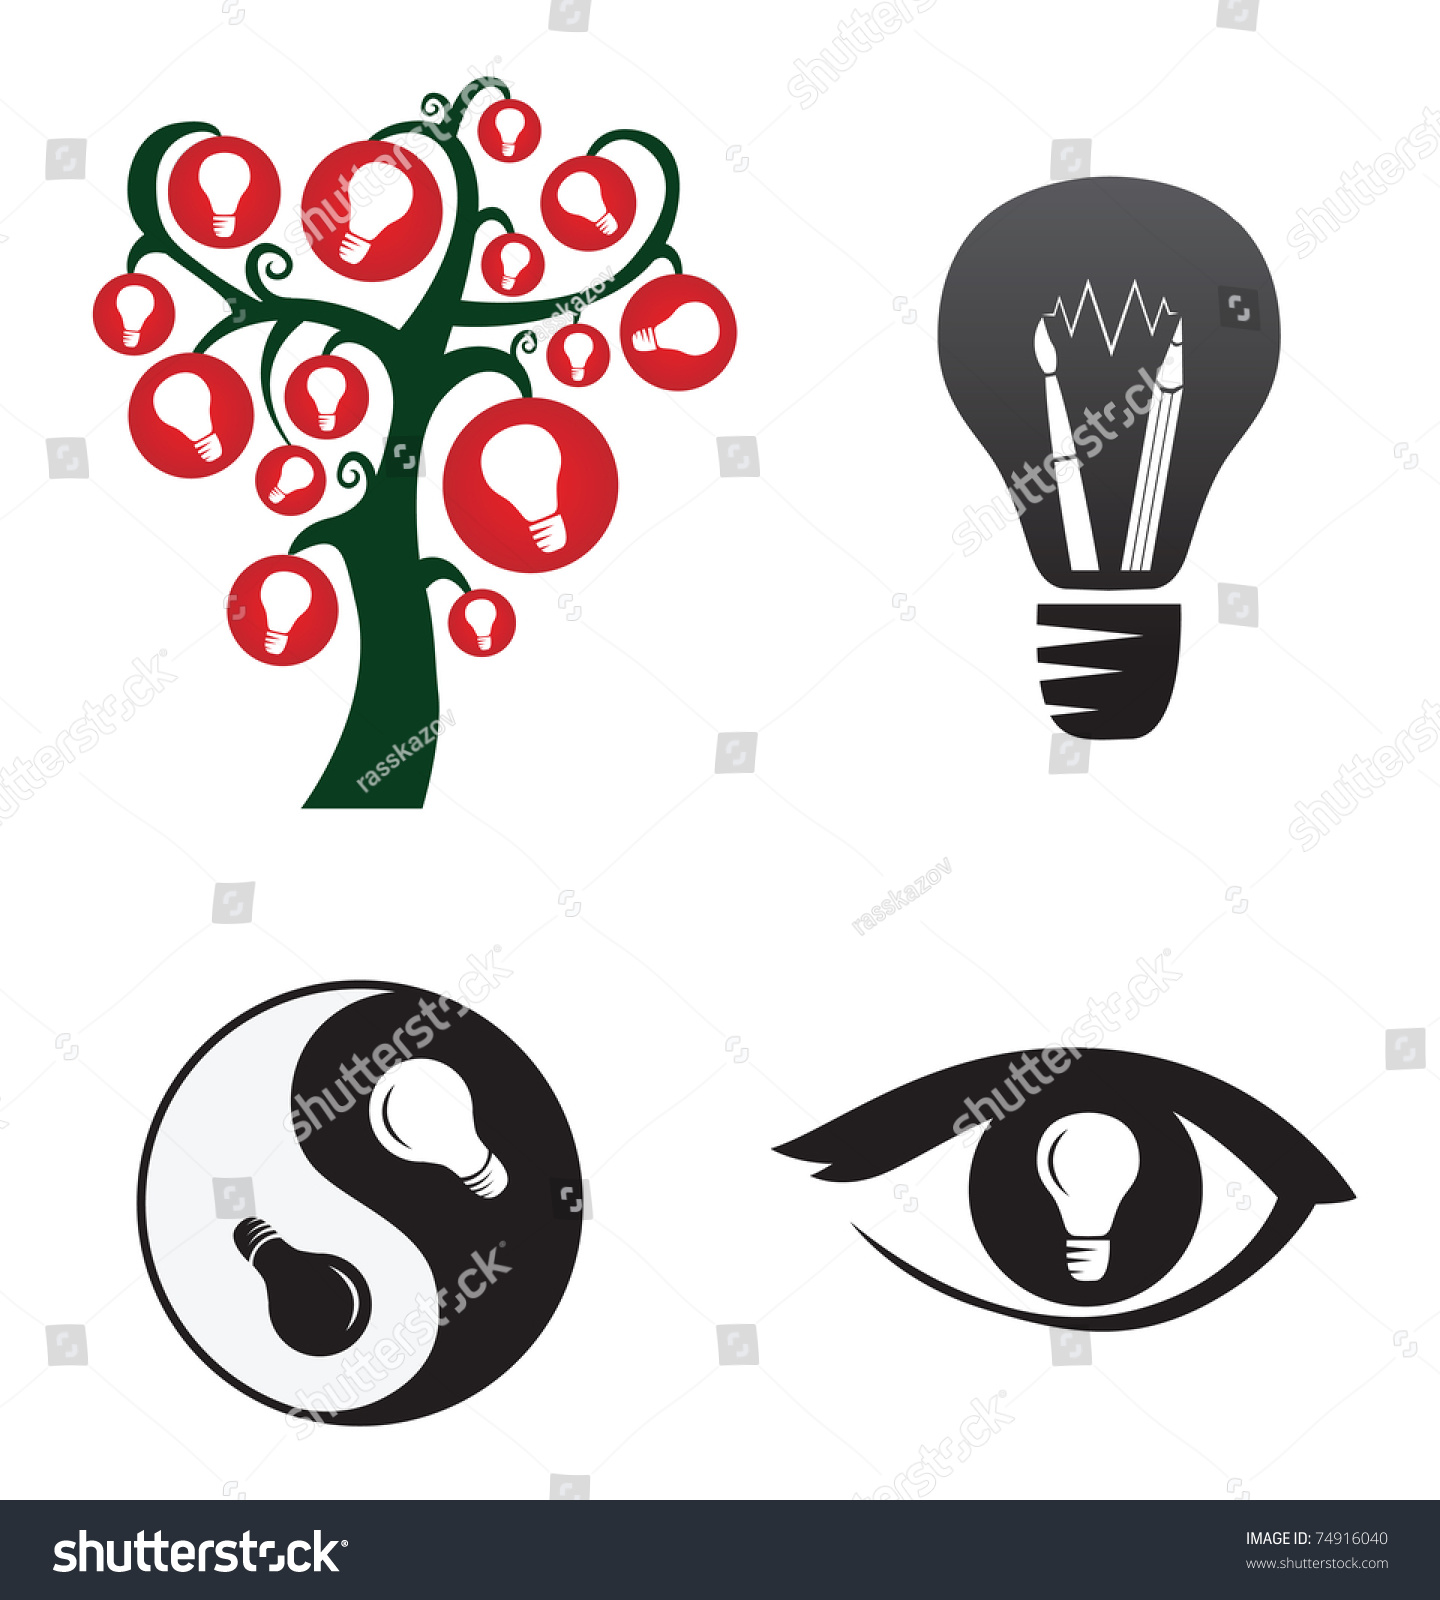 Creativity symbol